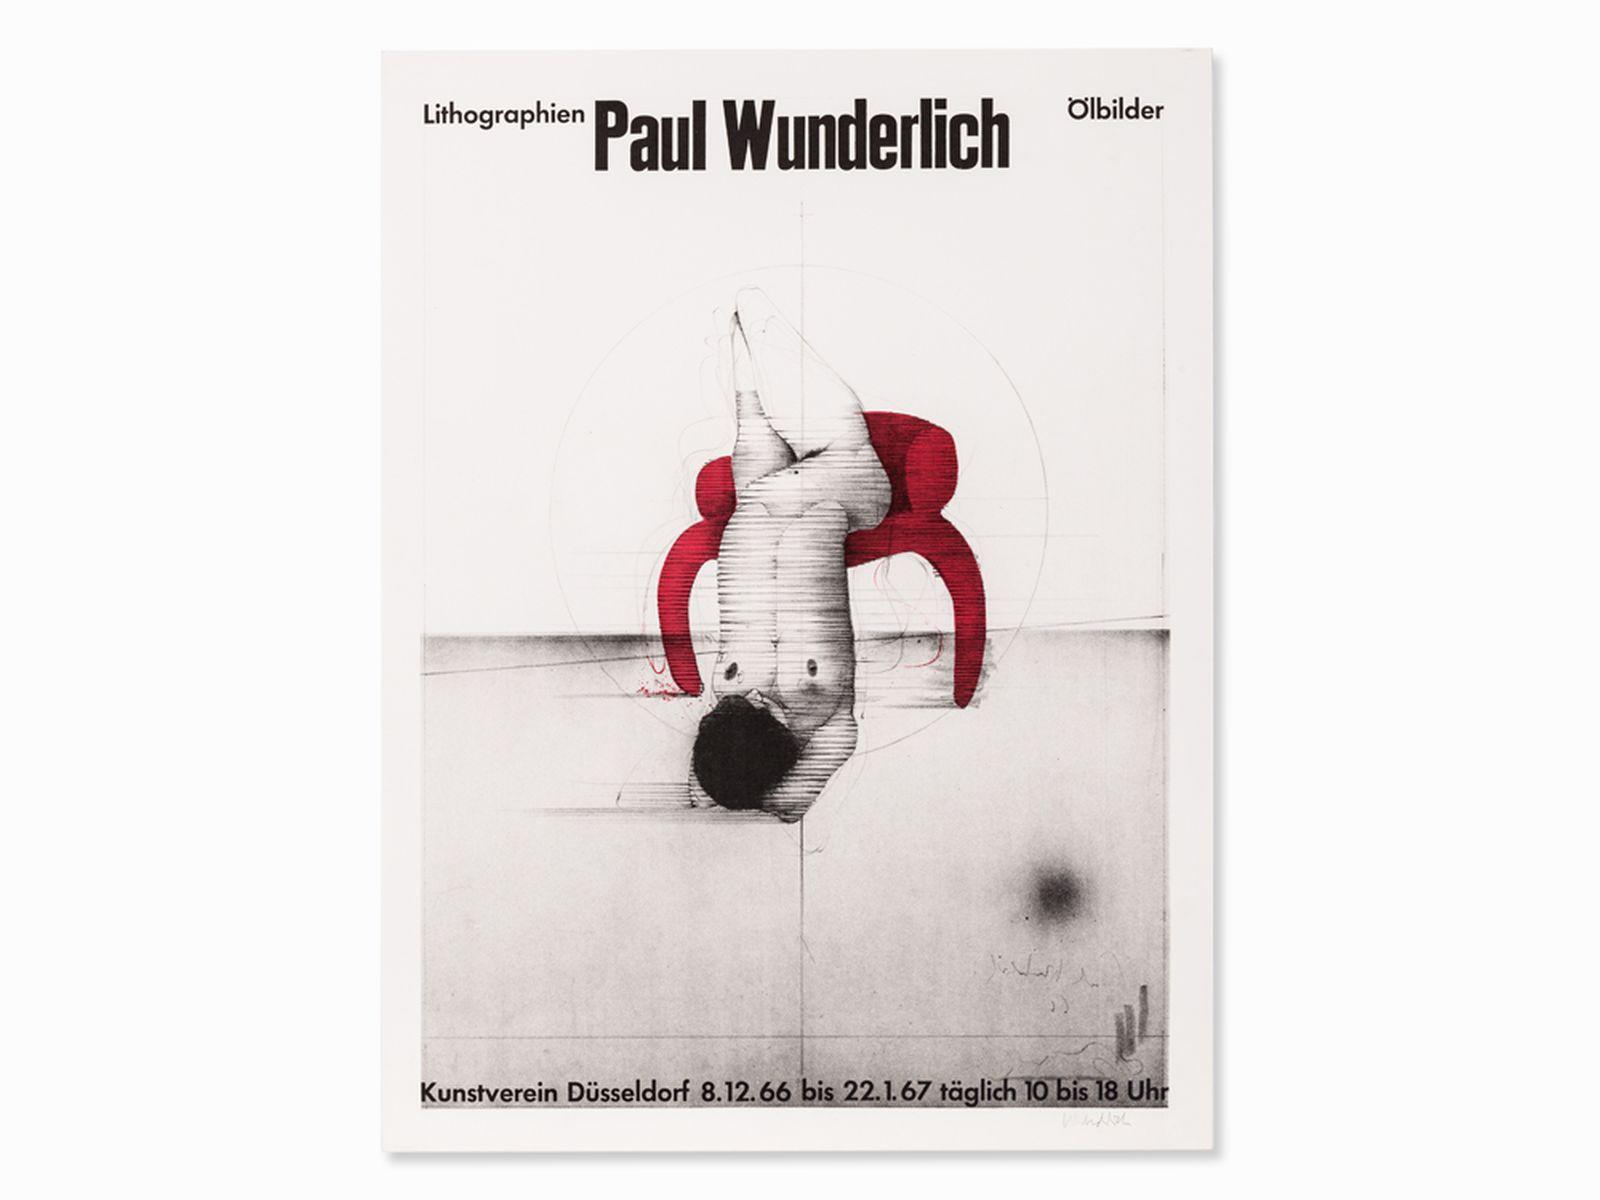 #71 Paul Wunderlich Image